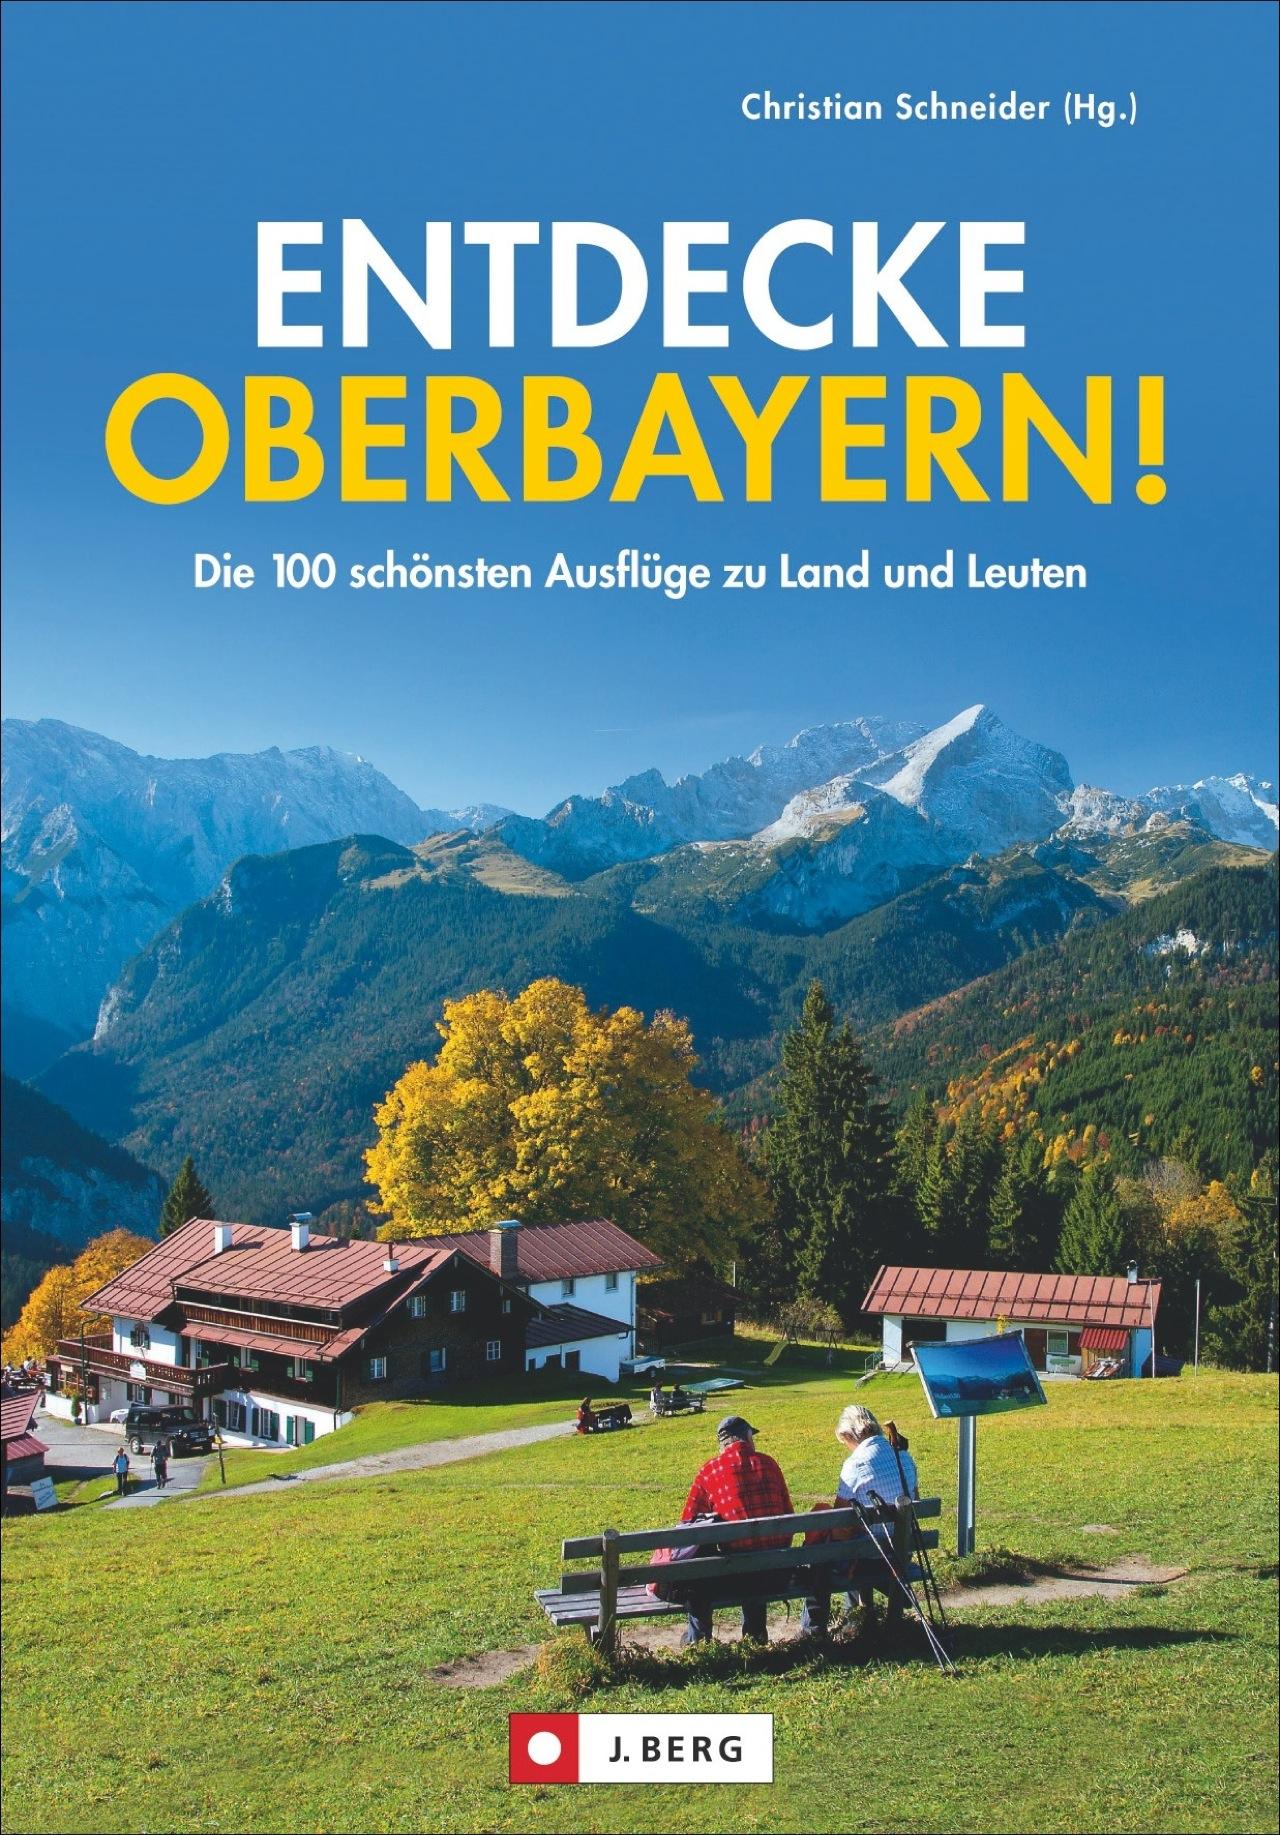 Entdecke Oberbayern!, Christian Schneider